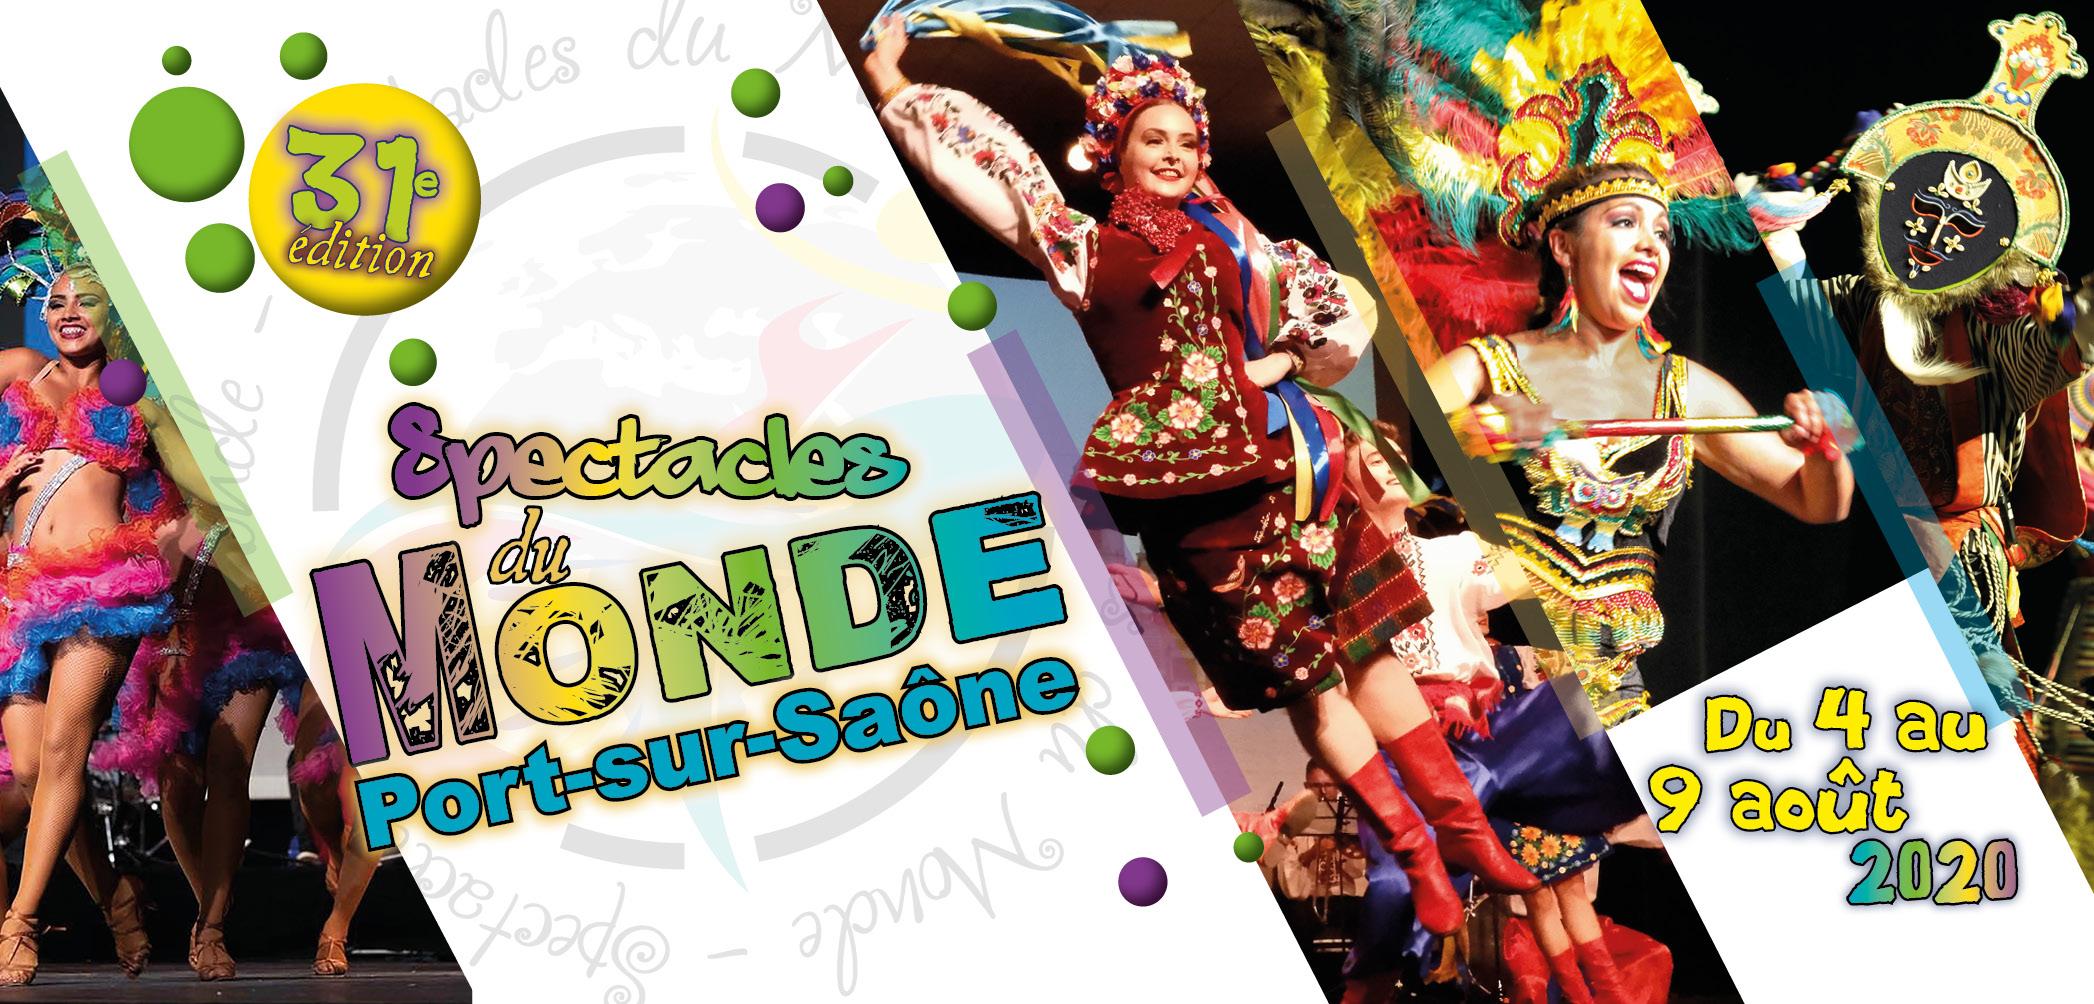 image de Festival International de Folklore 2020